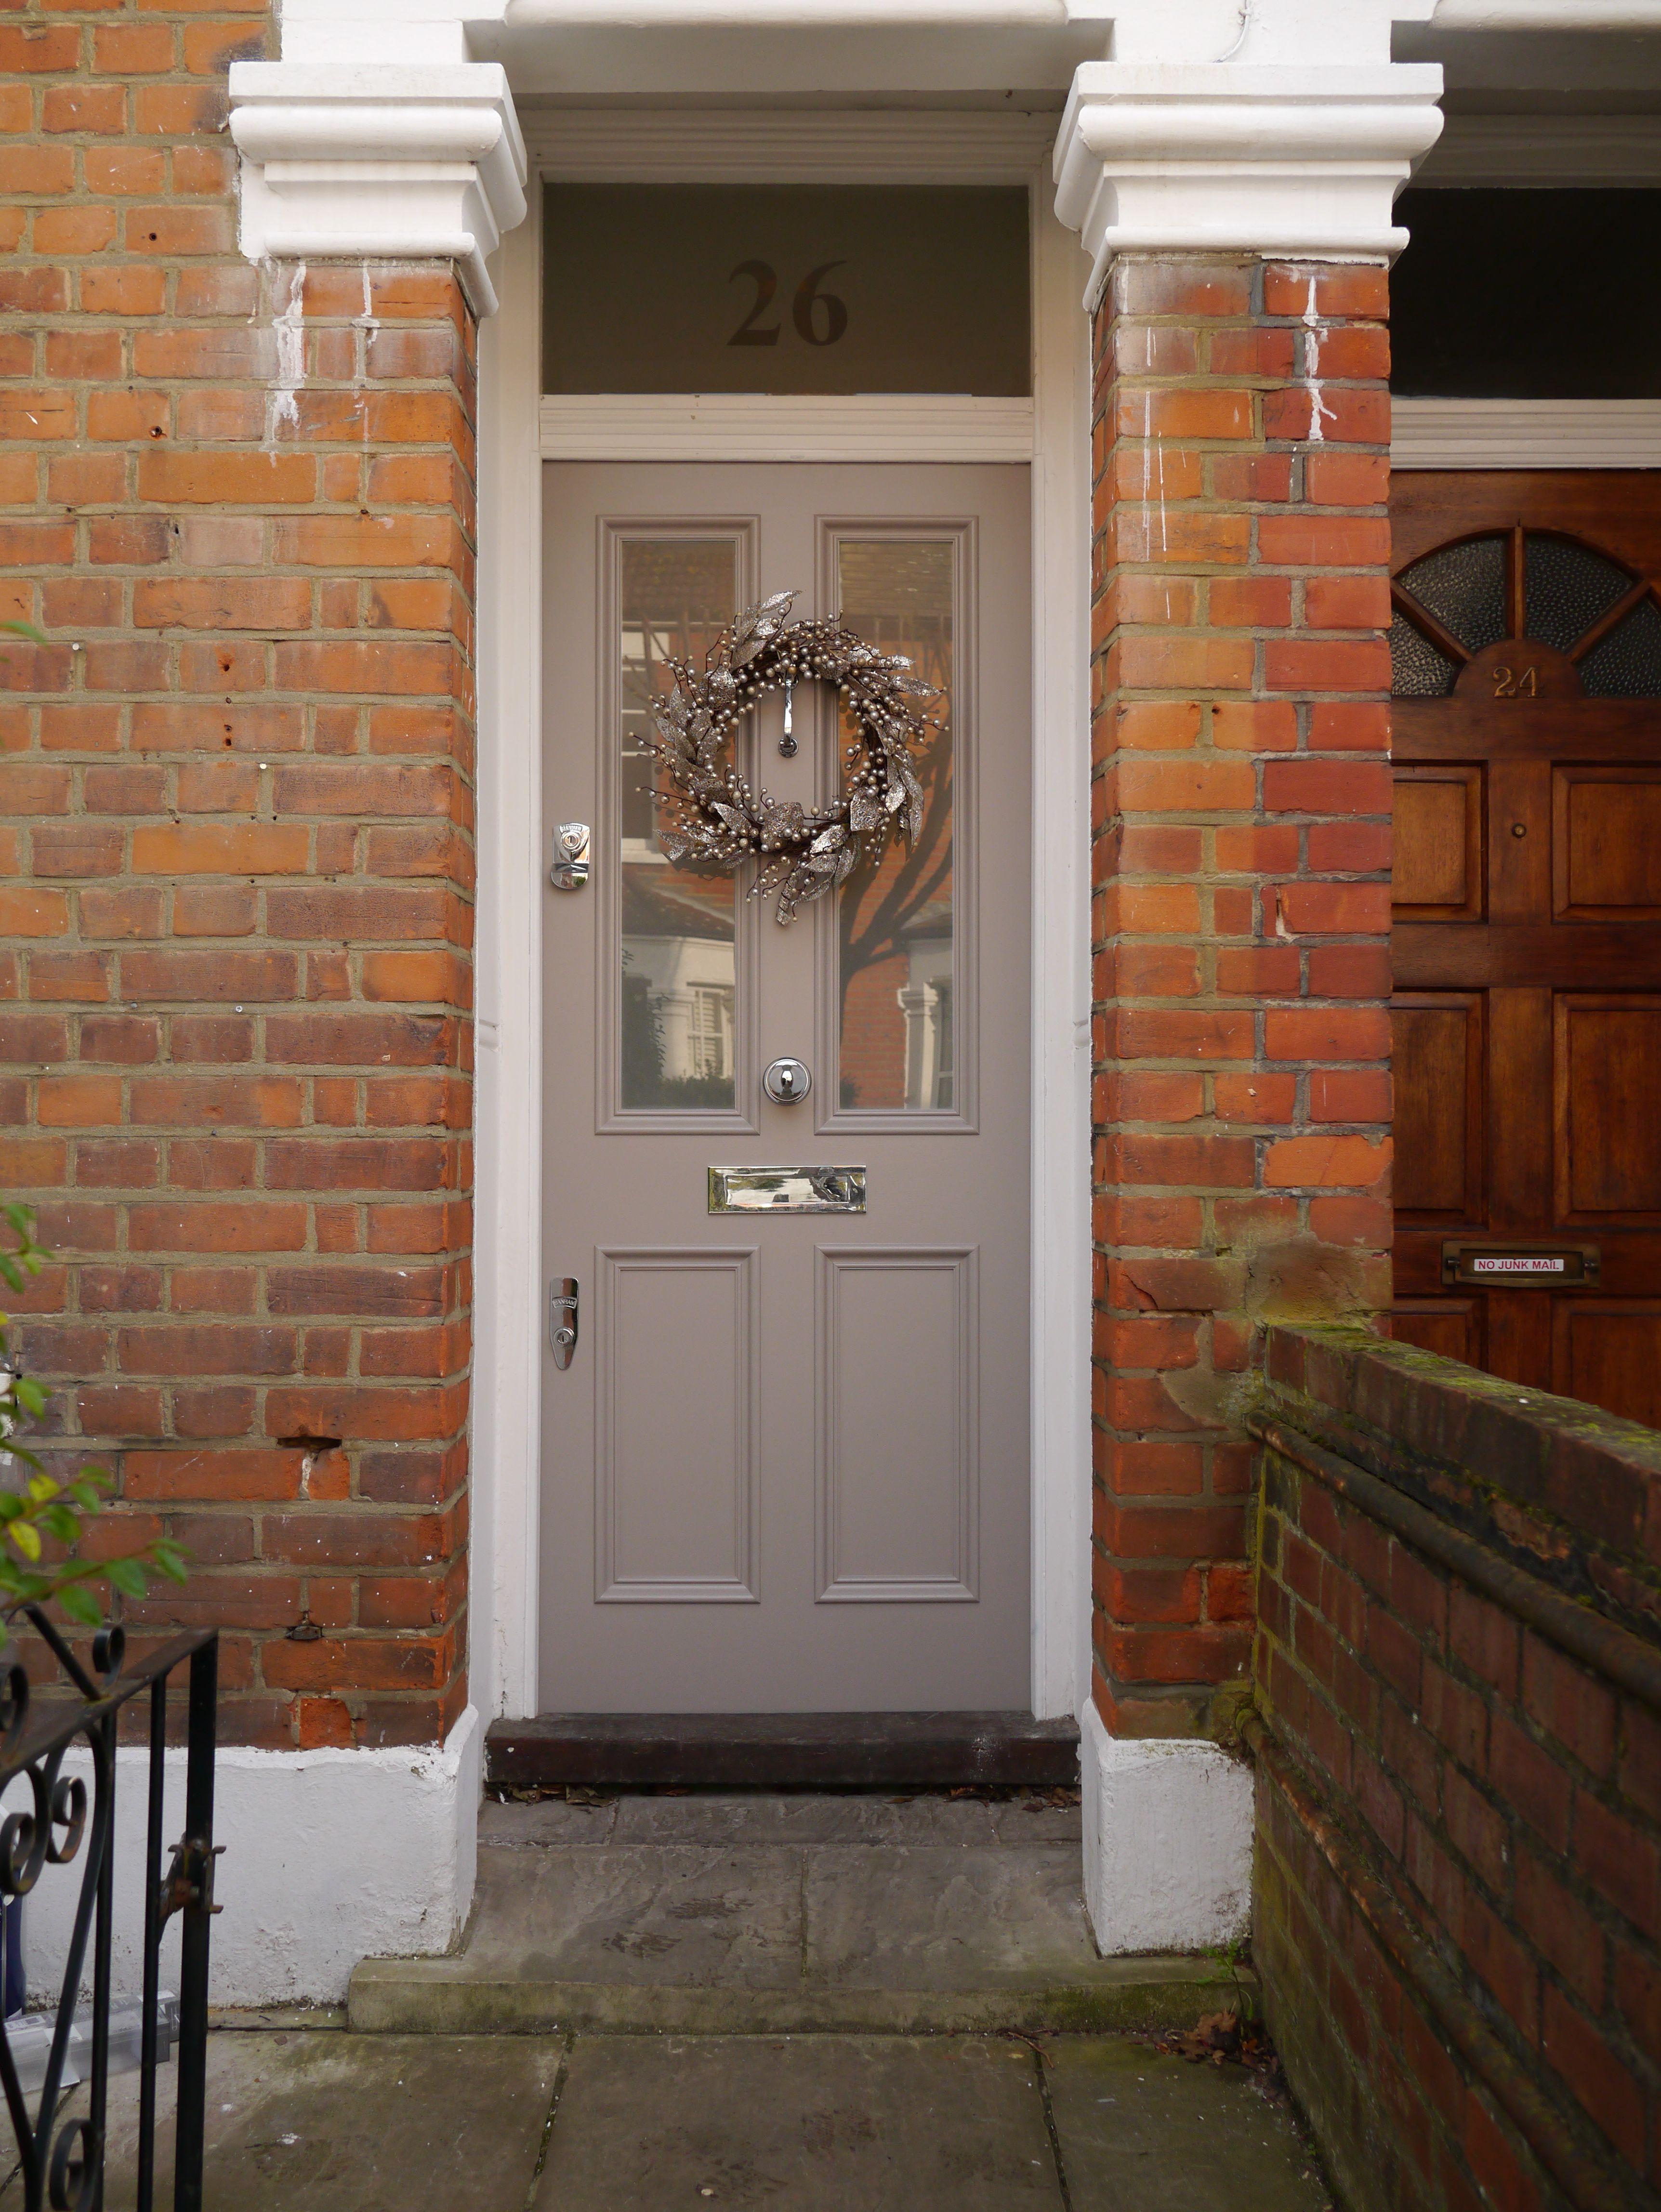 The London Door Company Wimbledon, London - LDC Mushroom Christmas ...